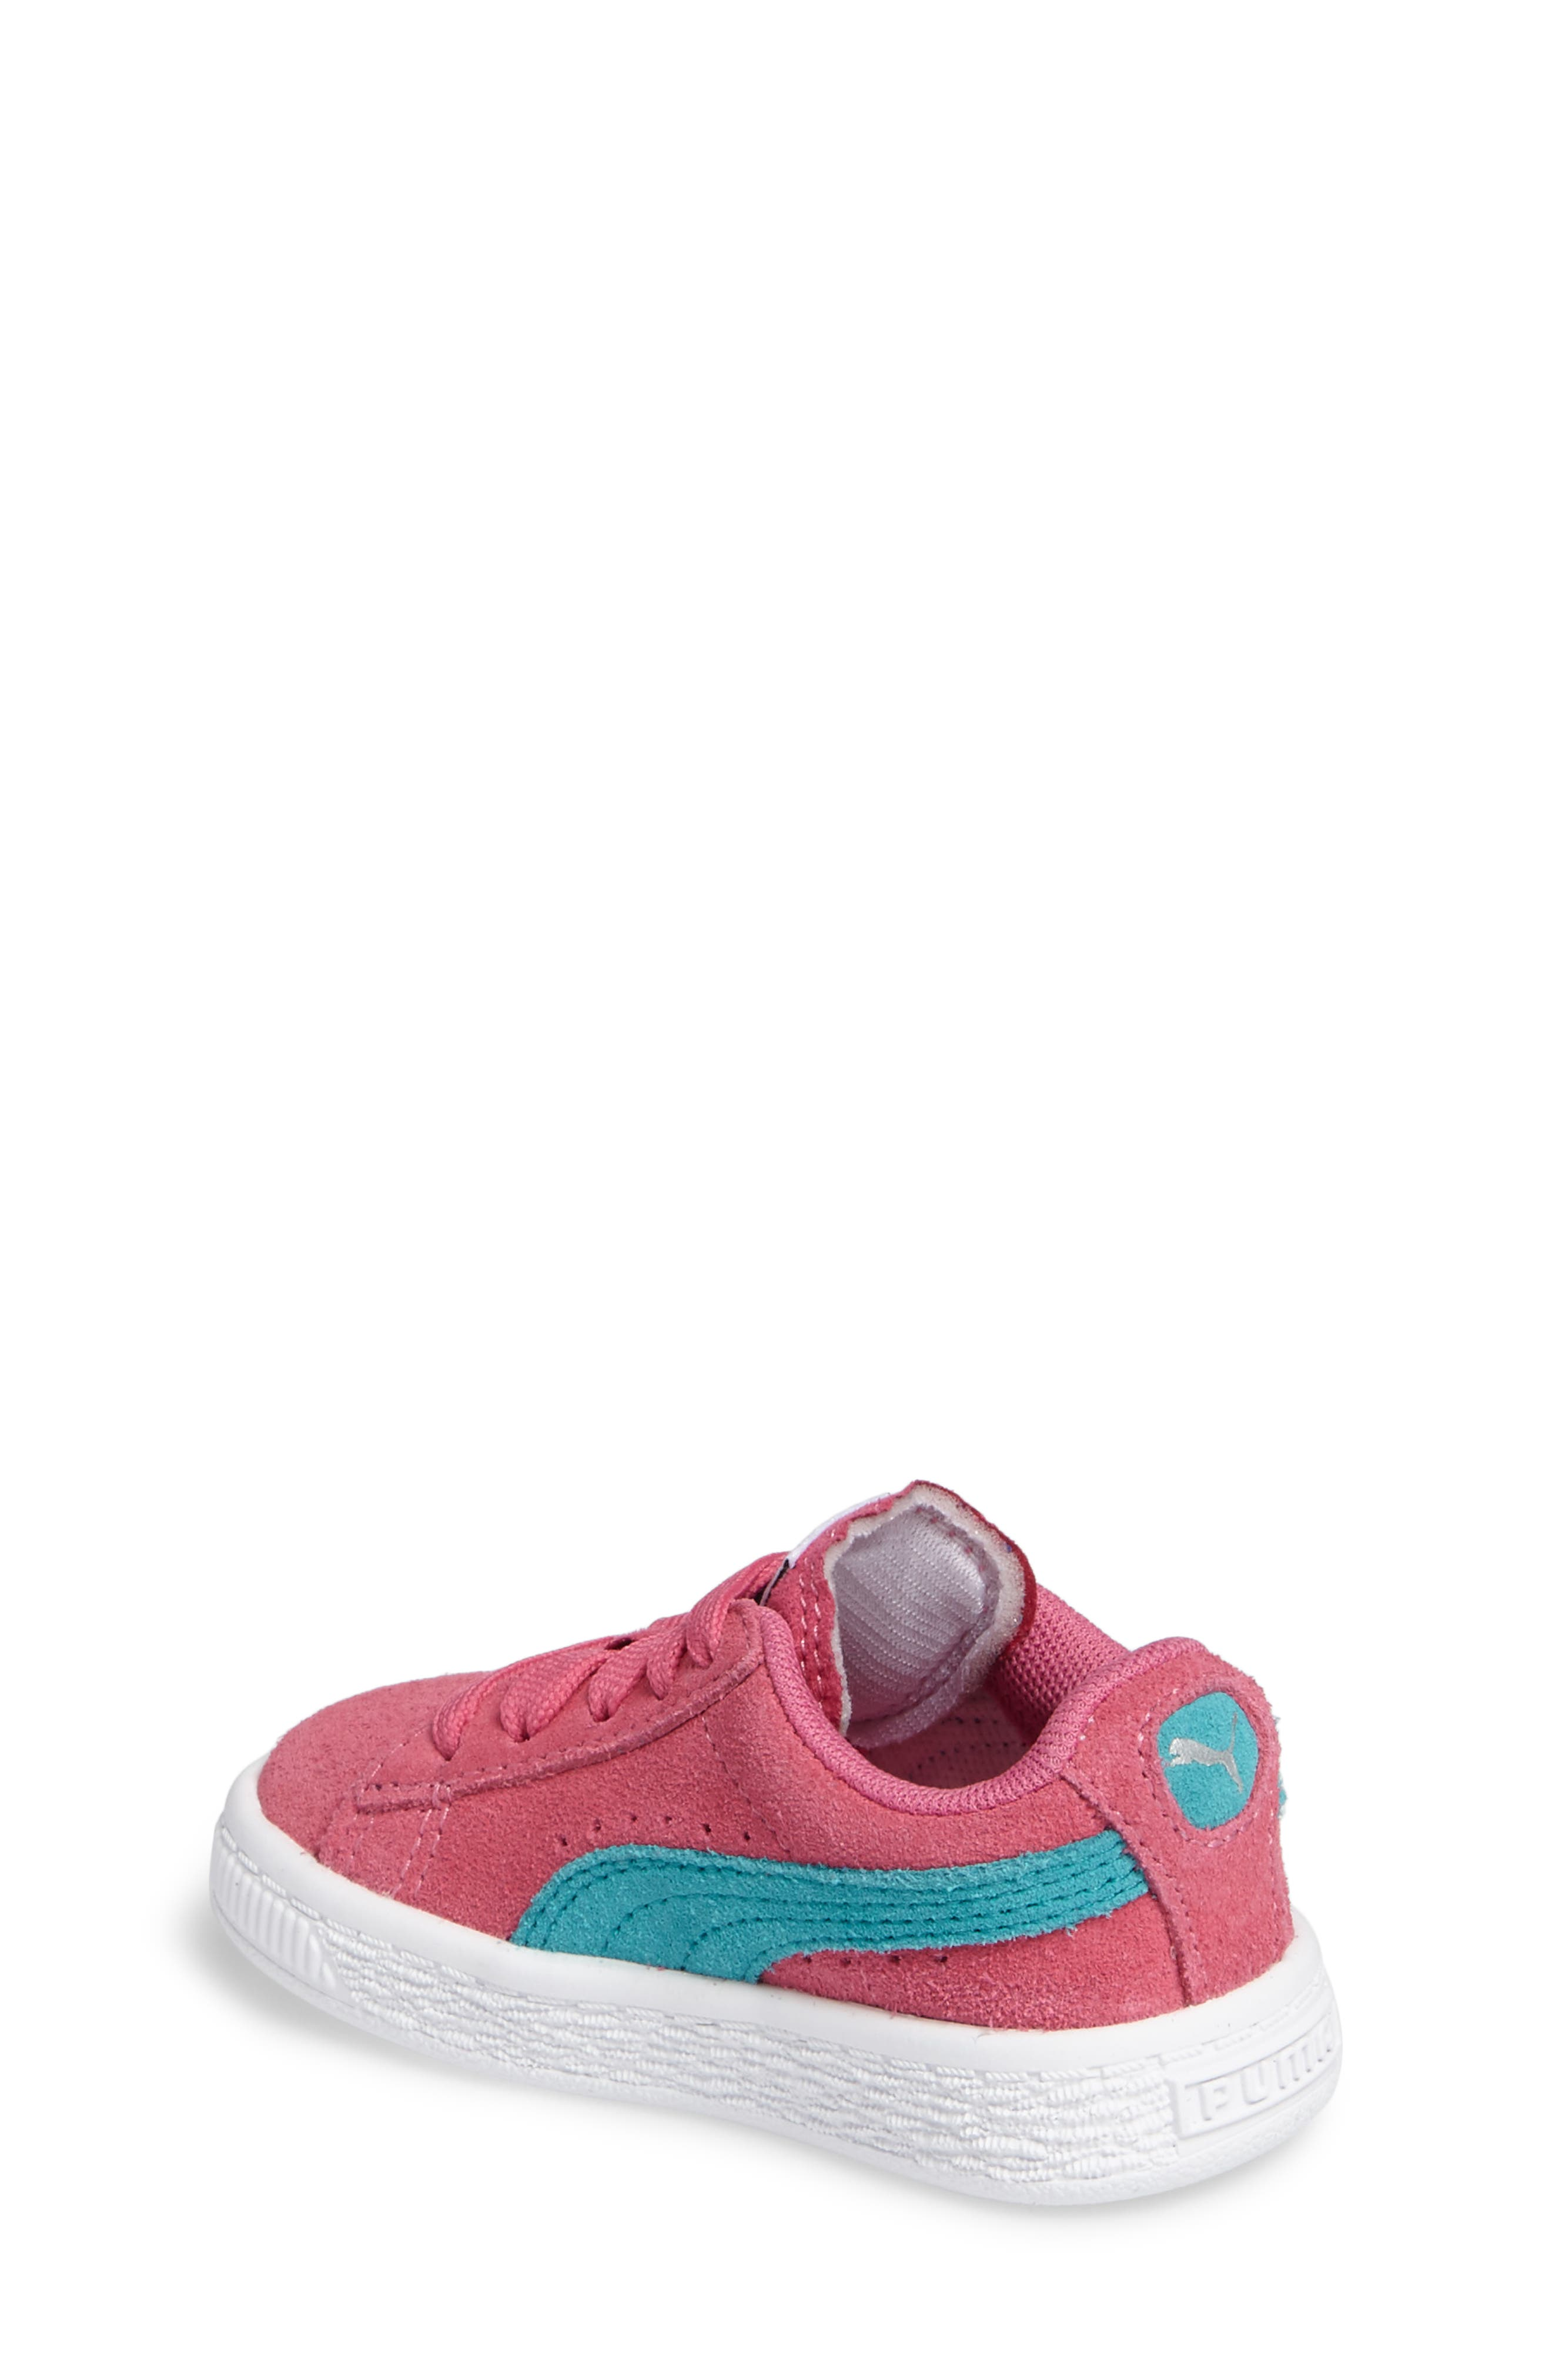 Suede Sneaker,                             Alternate thumbnail 2, color,                             690